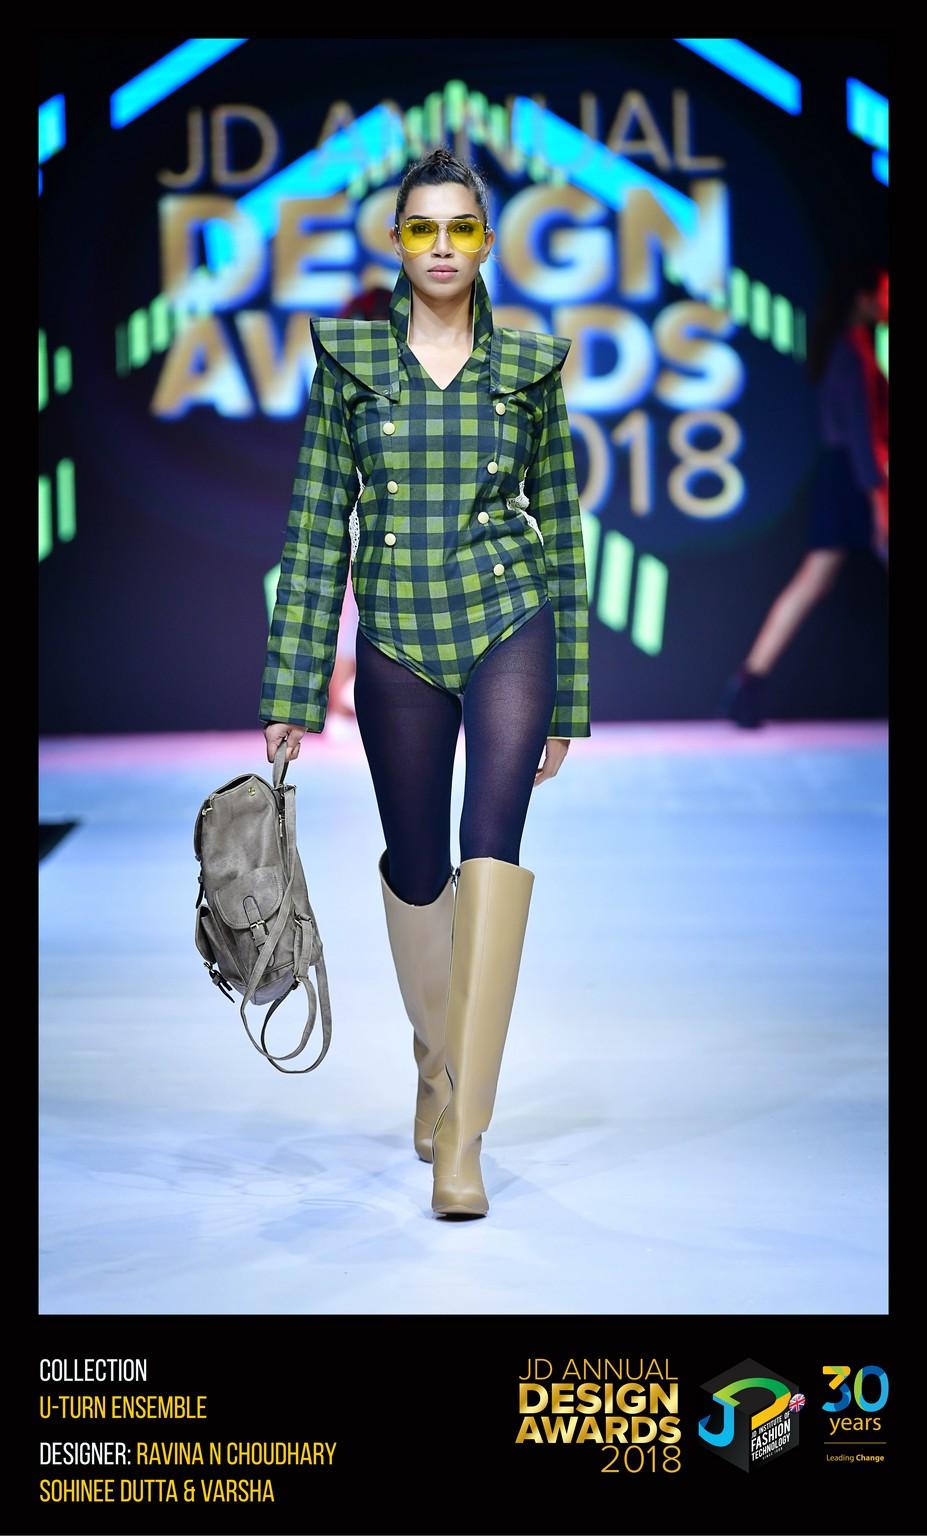 The U-turn ensemble – Change – JD Annual Design Awards 2018 | Designer: Sohinee, Ravina and Varsha | Photography : Jerin Nath (@jerin_nath) the u-turn ensemble – change – jd annual design awards 2018 The U-turn ensemble – Change – JD Annual Design Awards 2018 U TURN ENSEMBLE 5